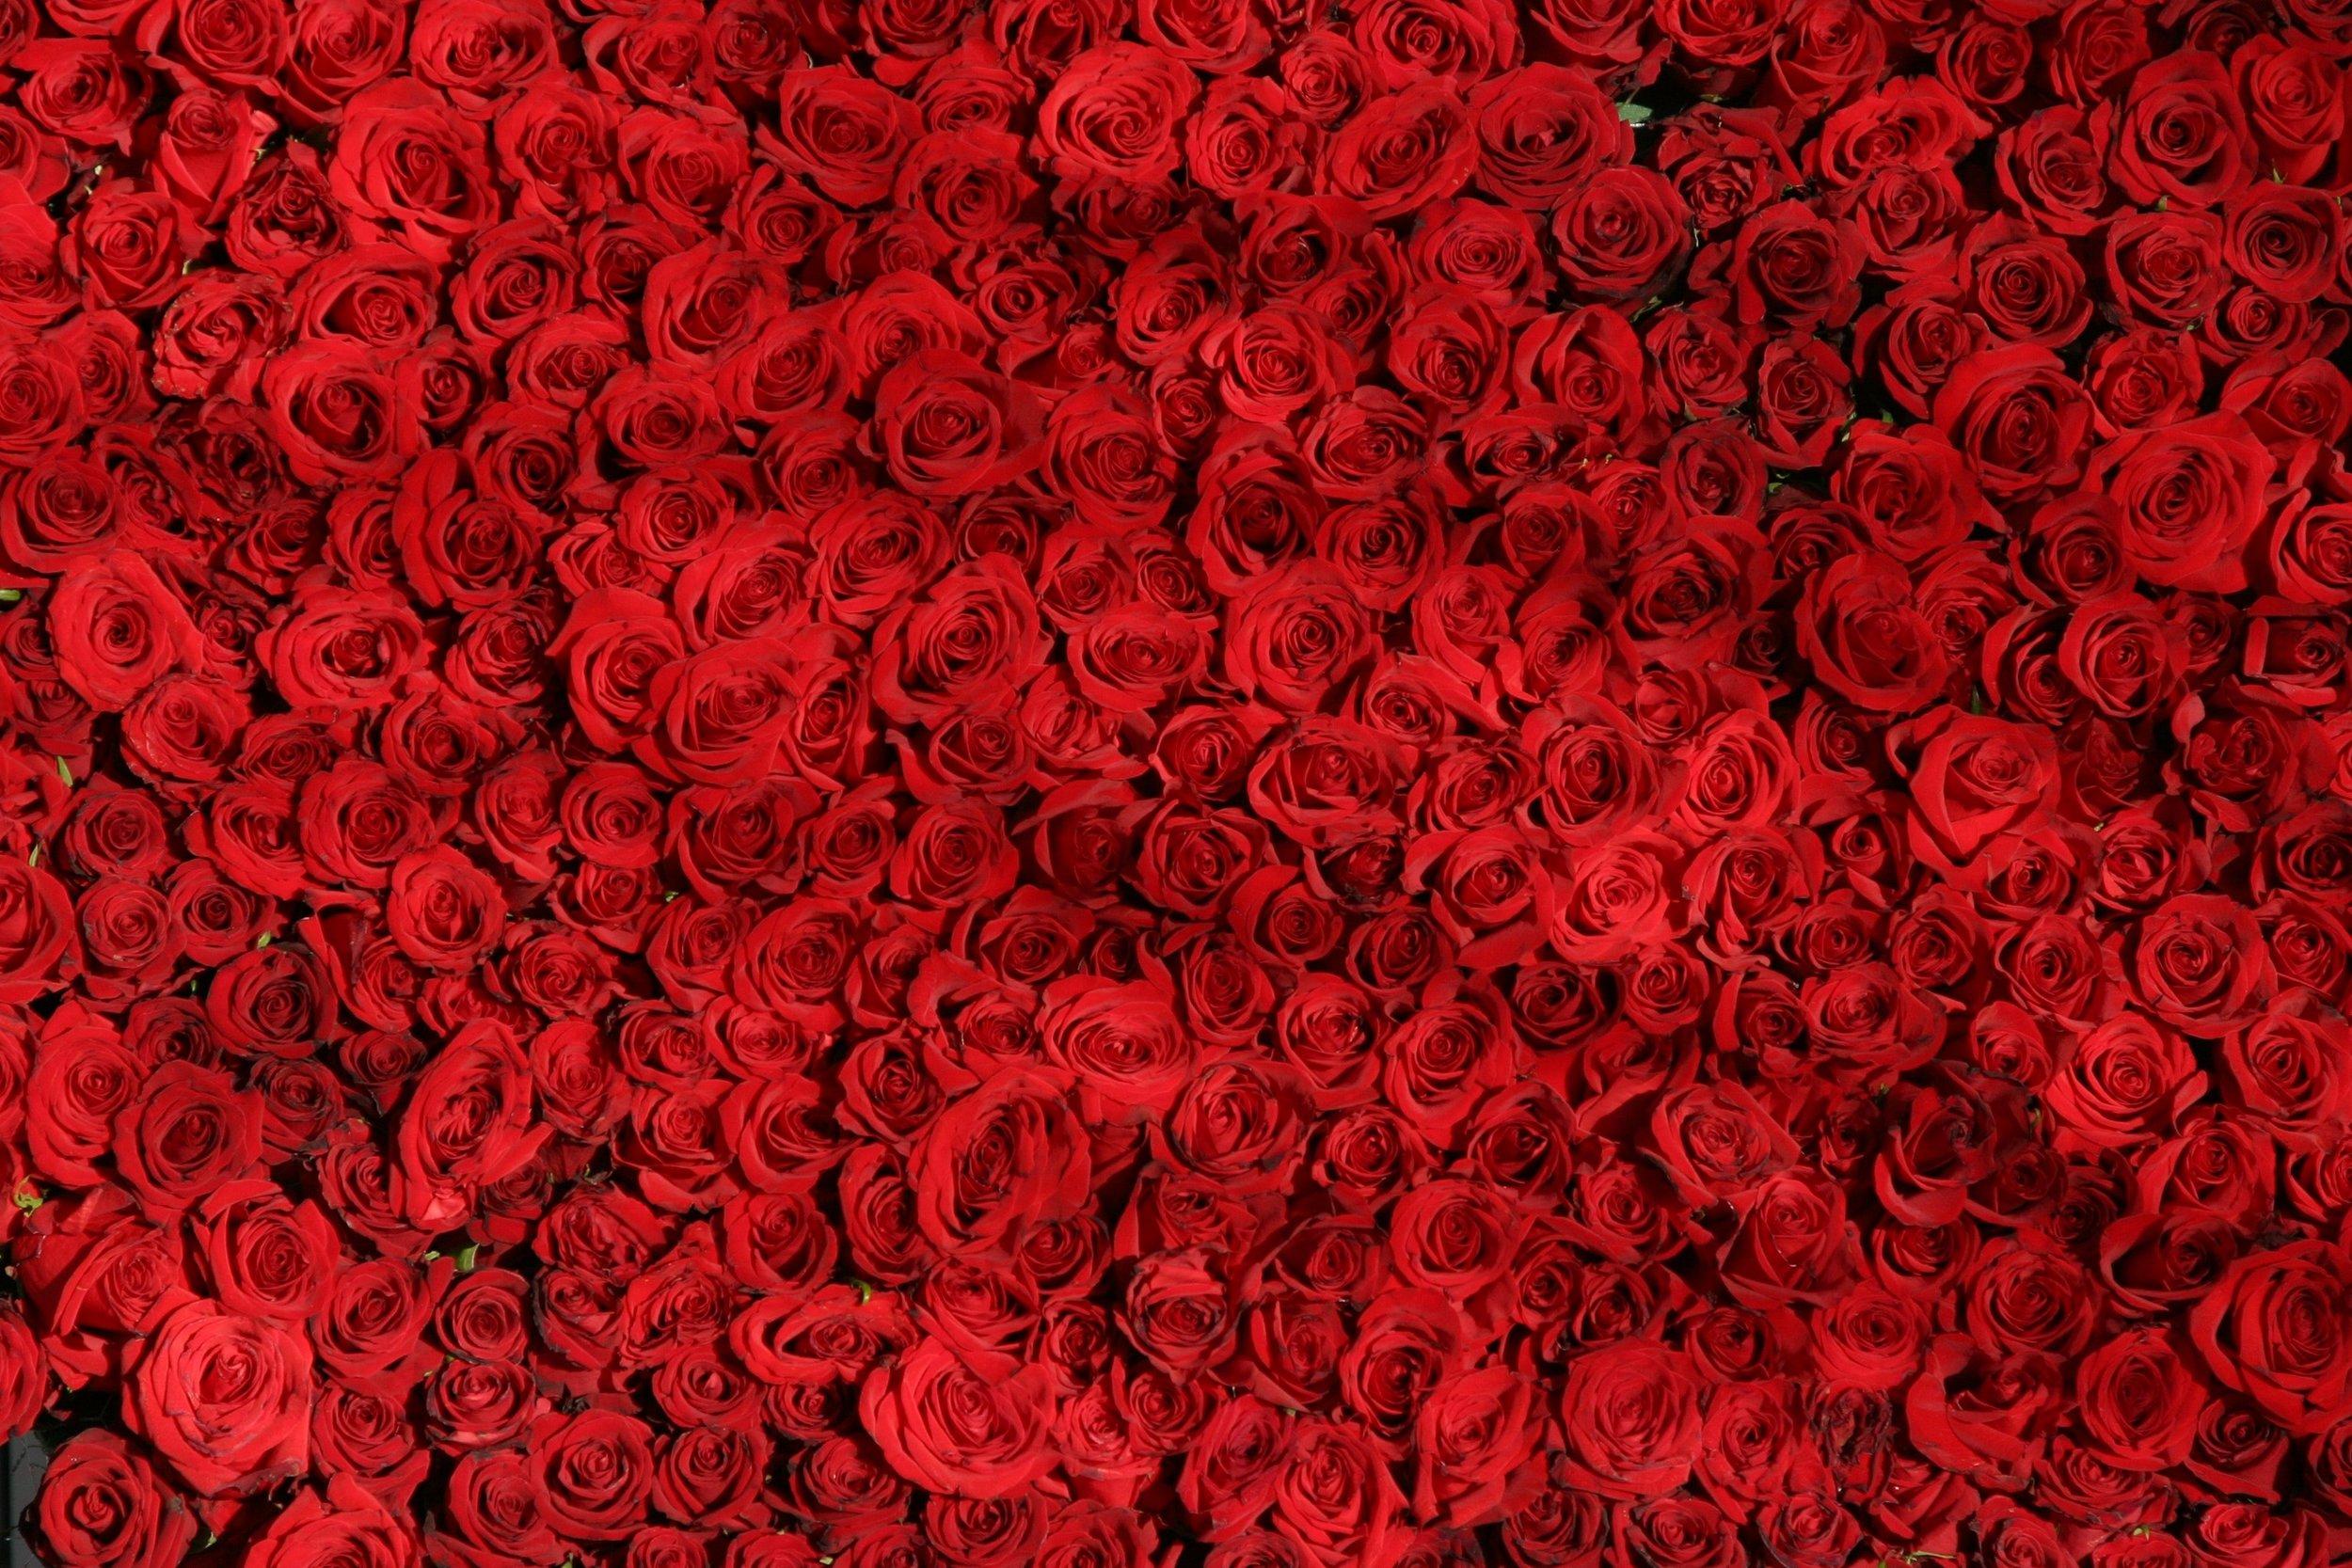 arranged-flowers-love-54320.jpg